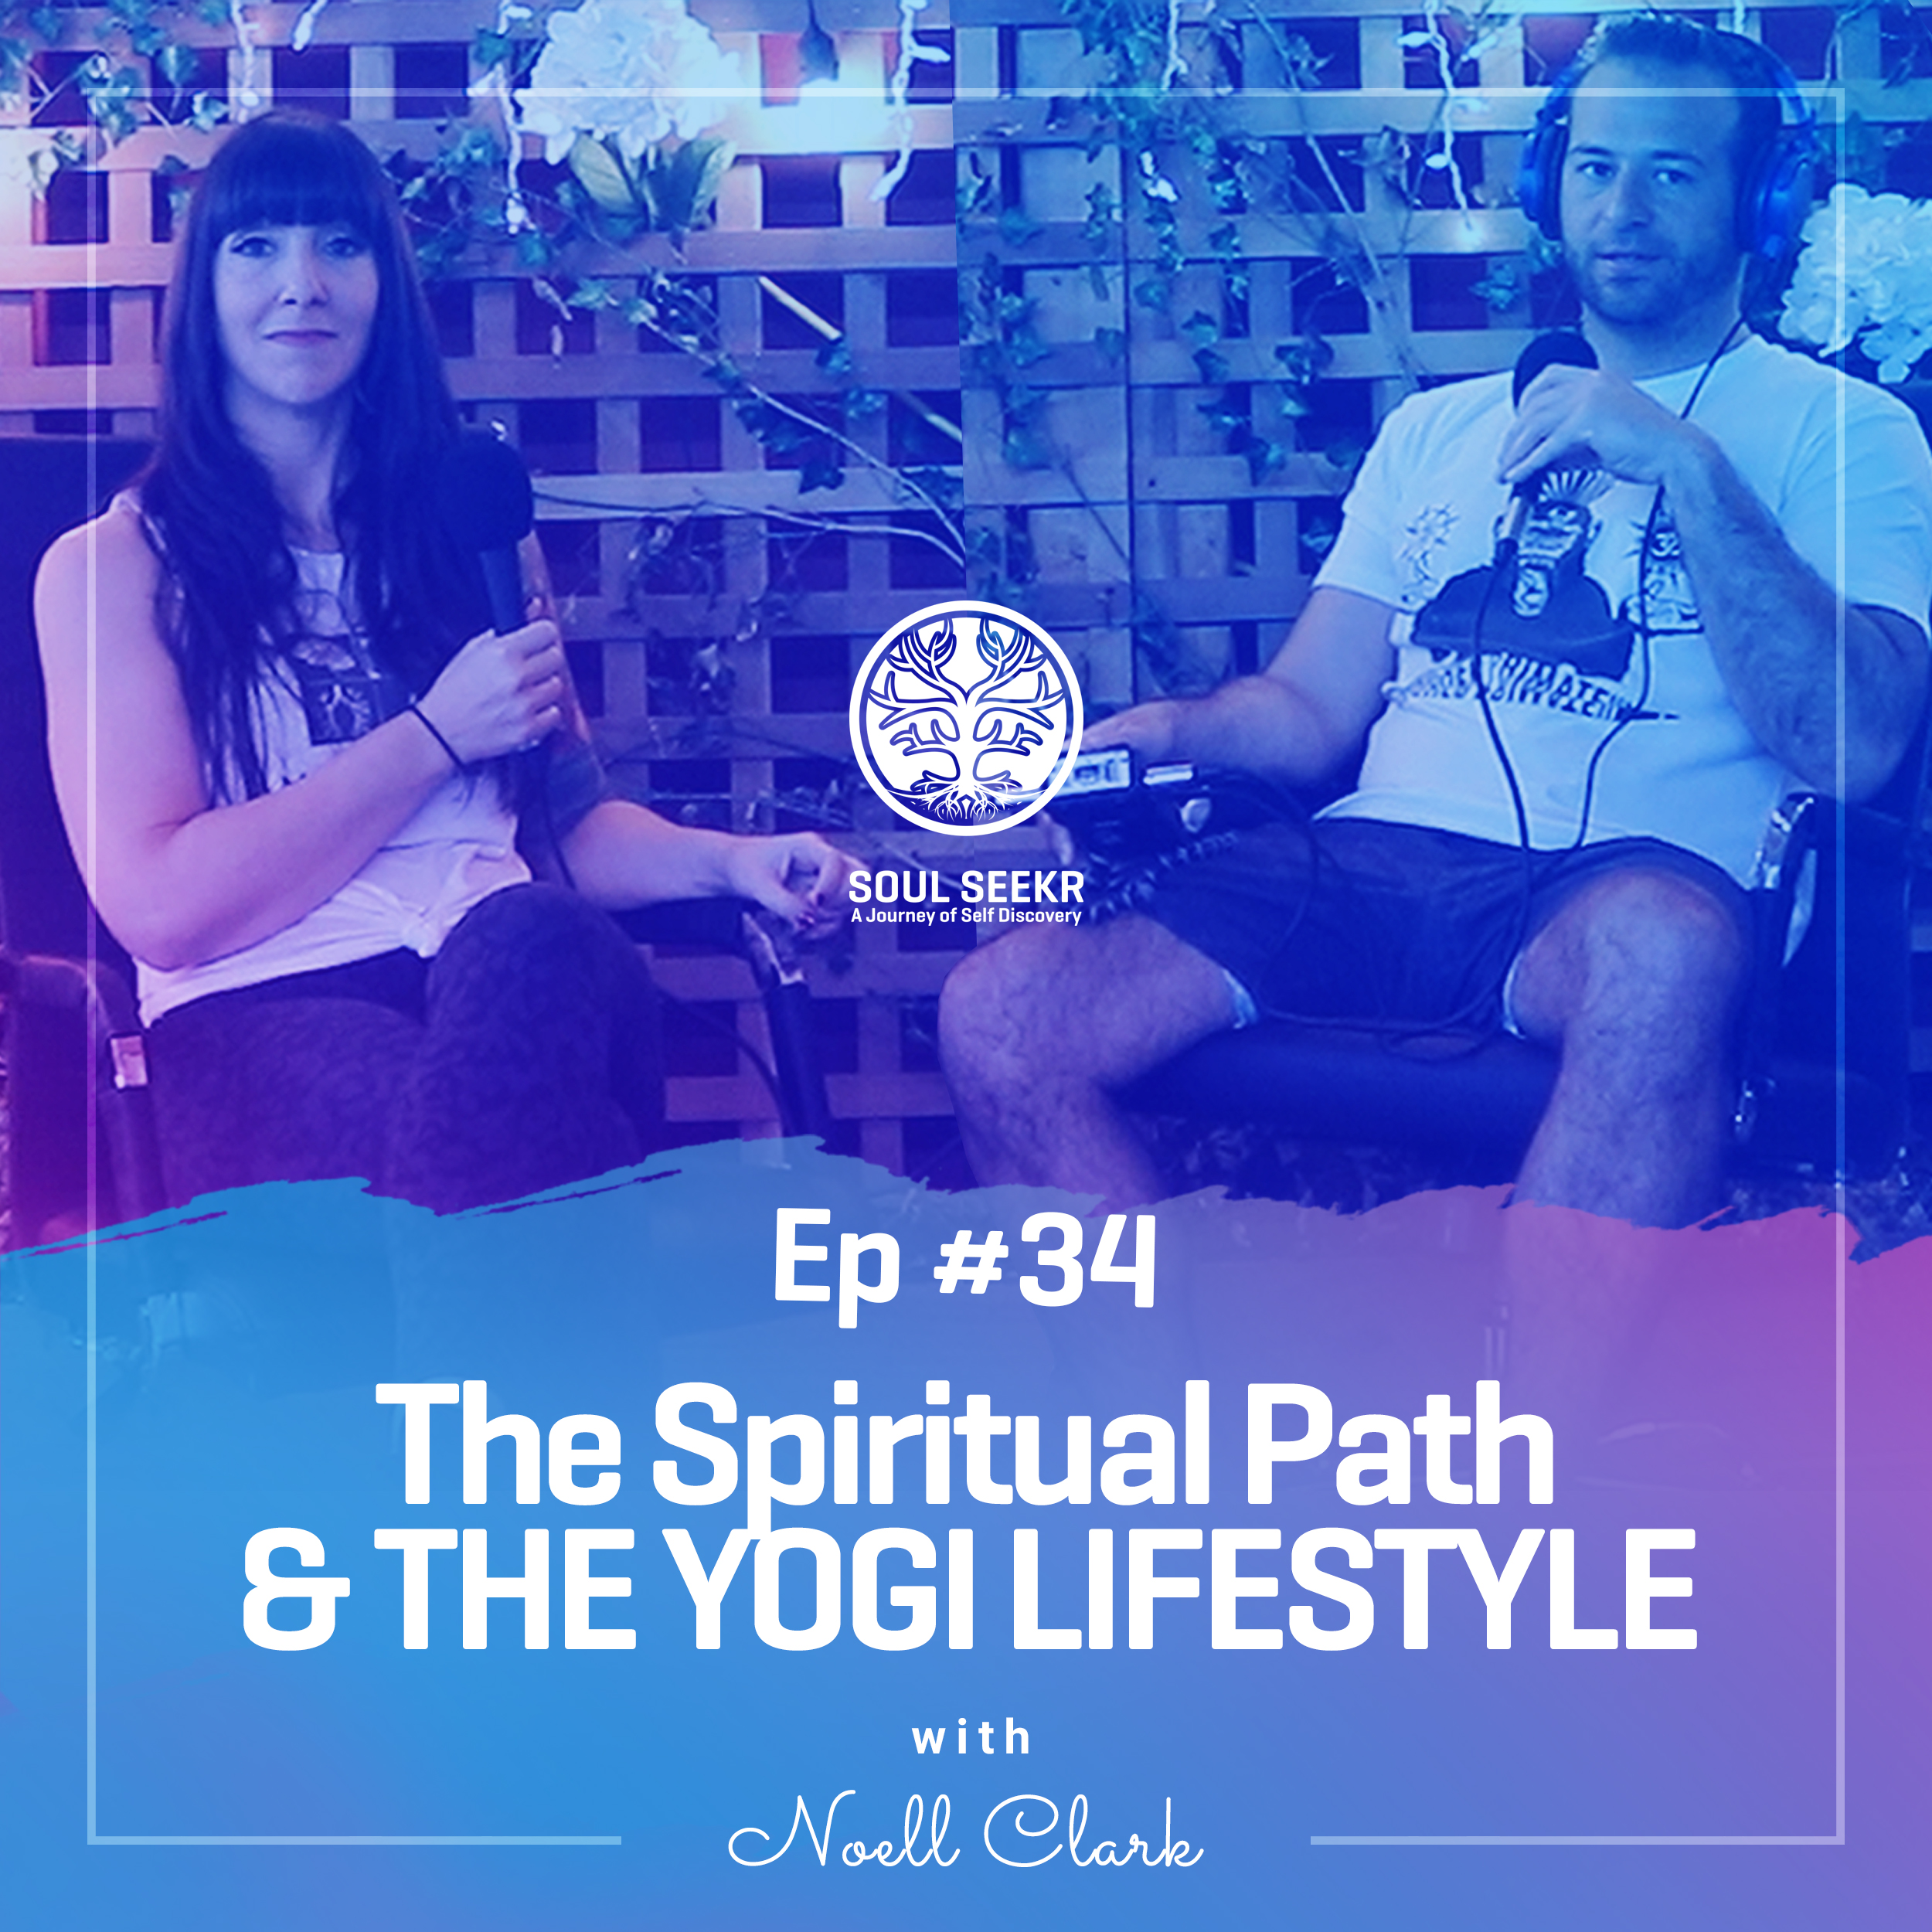 #34: The Spiritual Path & The Yogi Lifestyle with Noell Clark